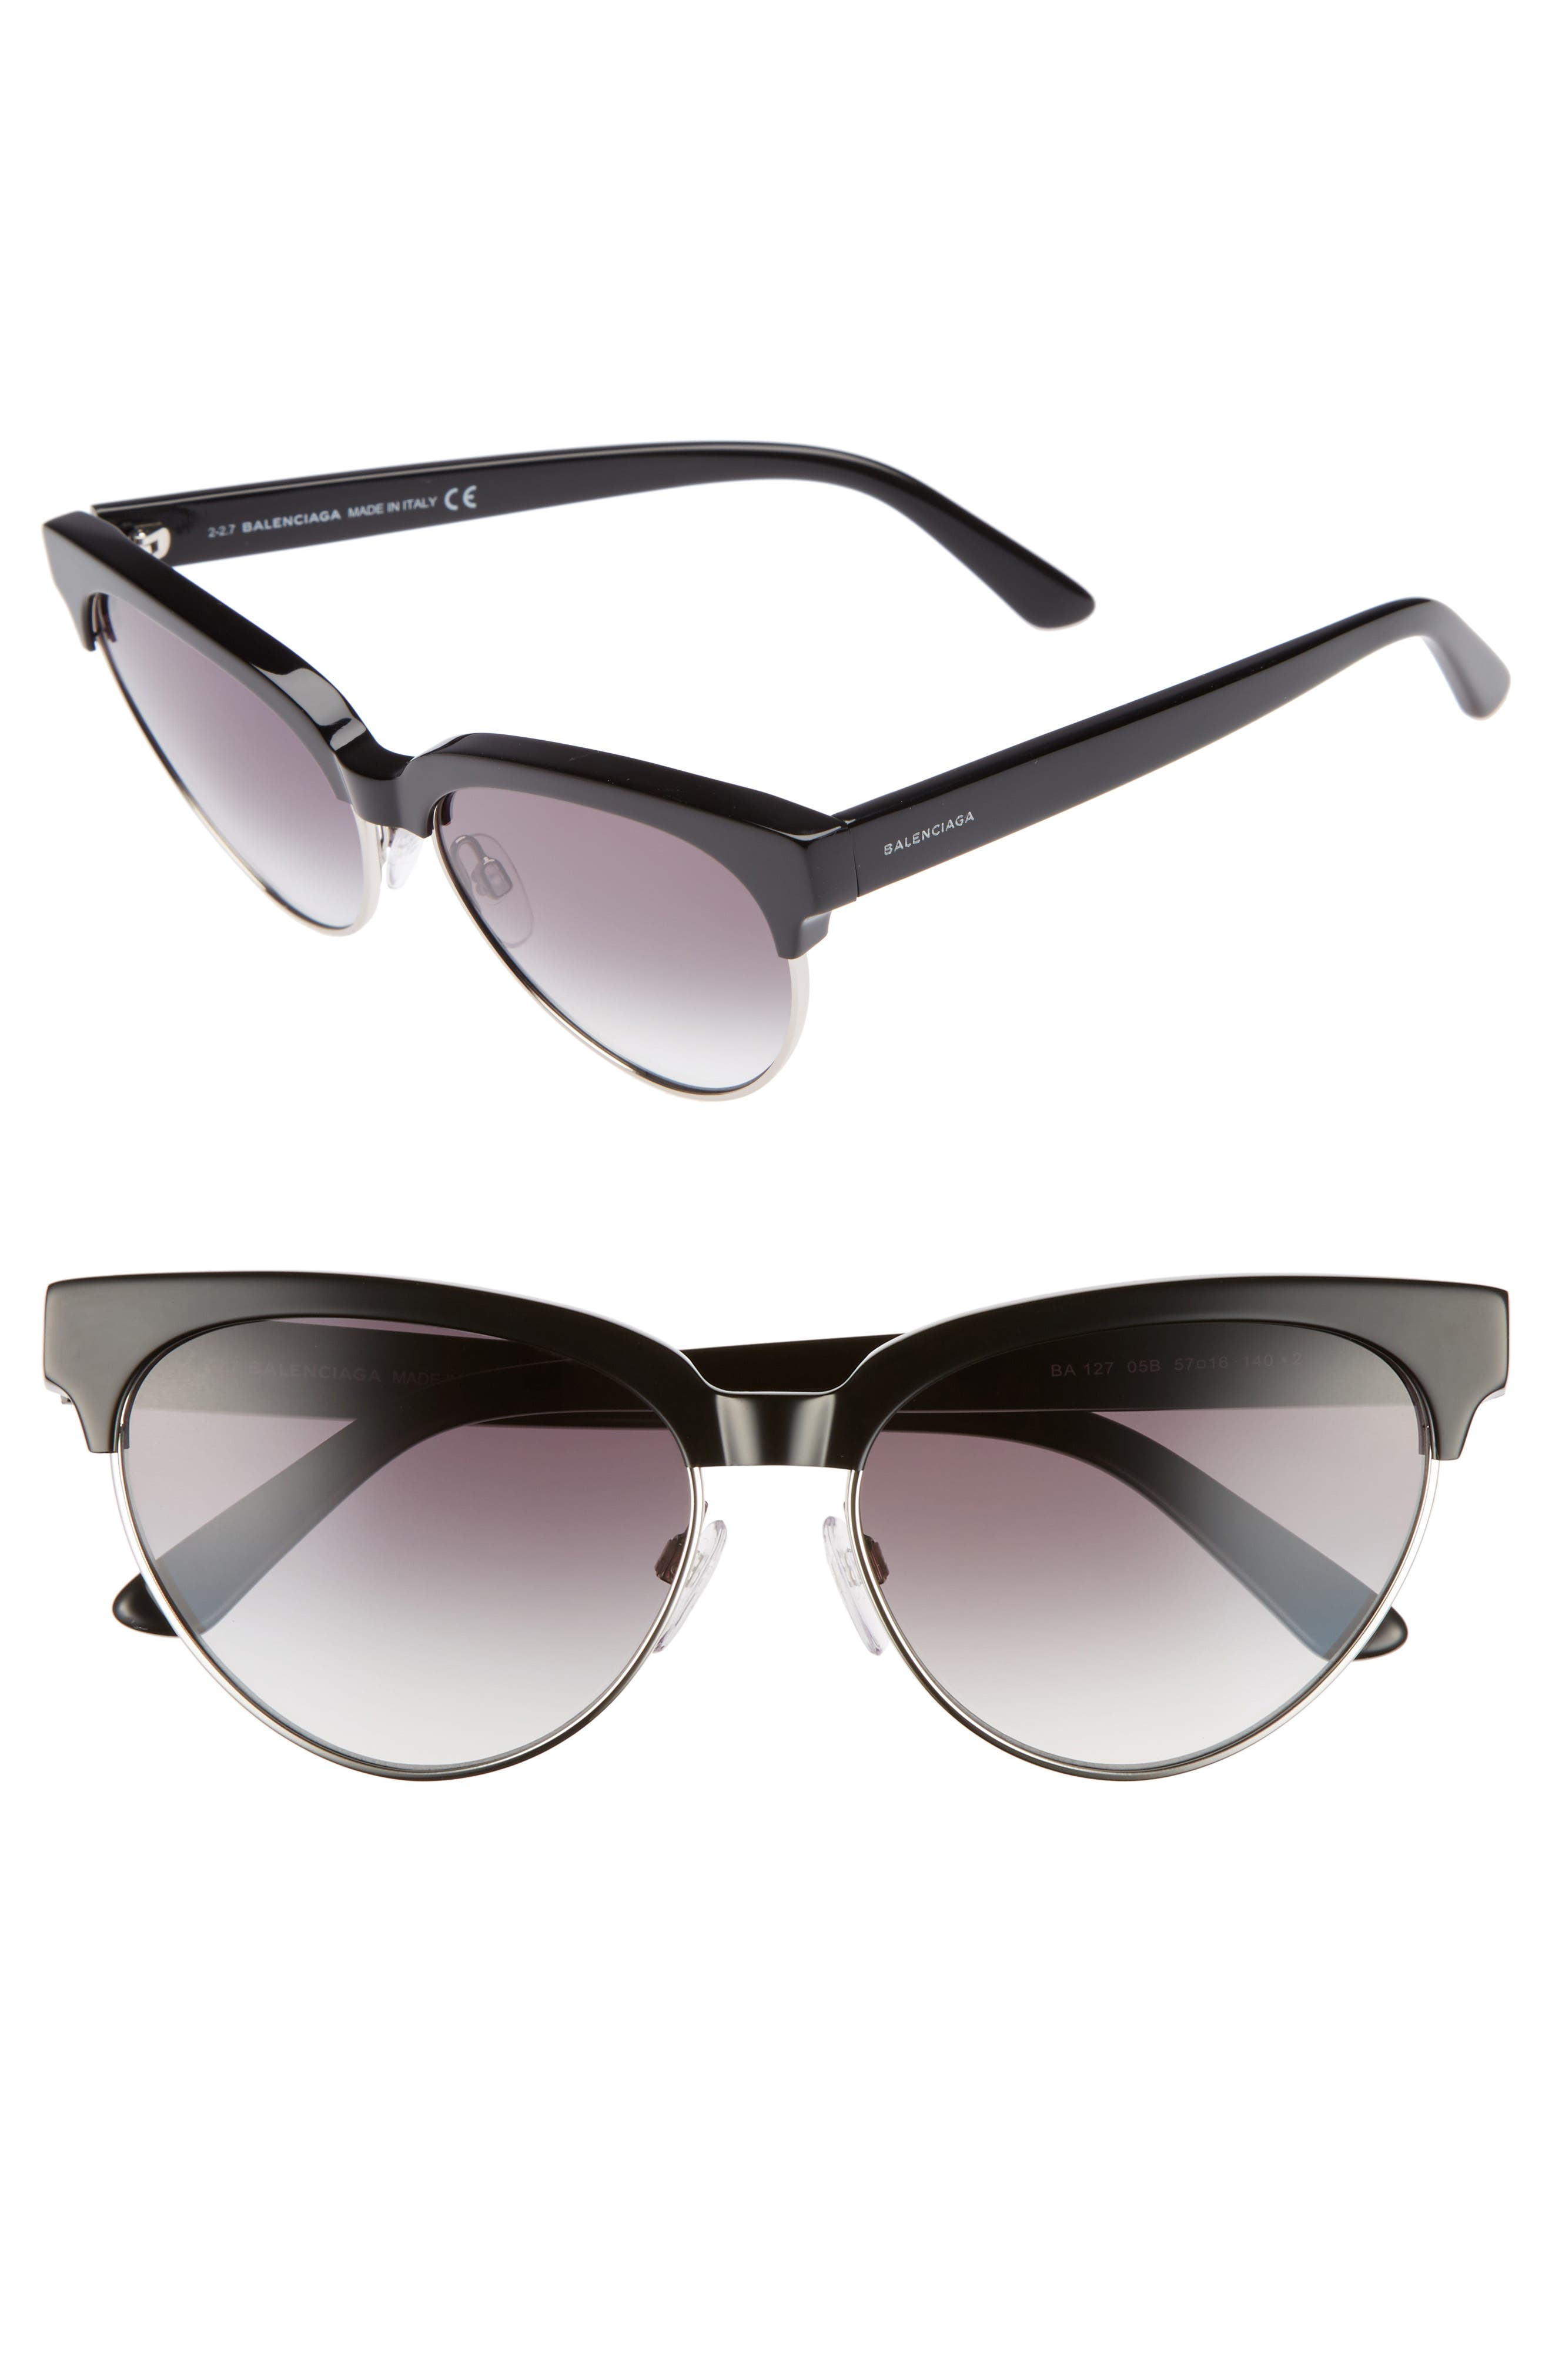 57mm Gradient Cat Eye Sunglasses,                             Main thumbnail 1, color,                             001